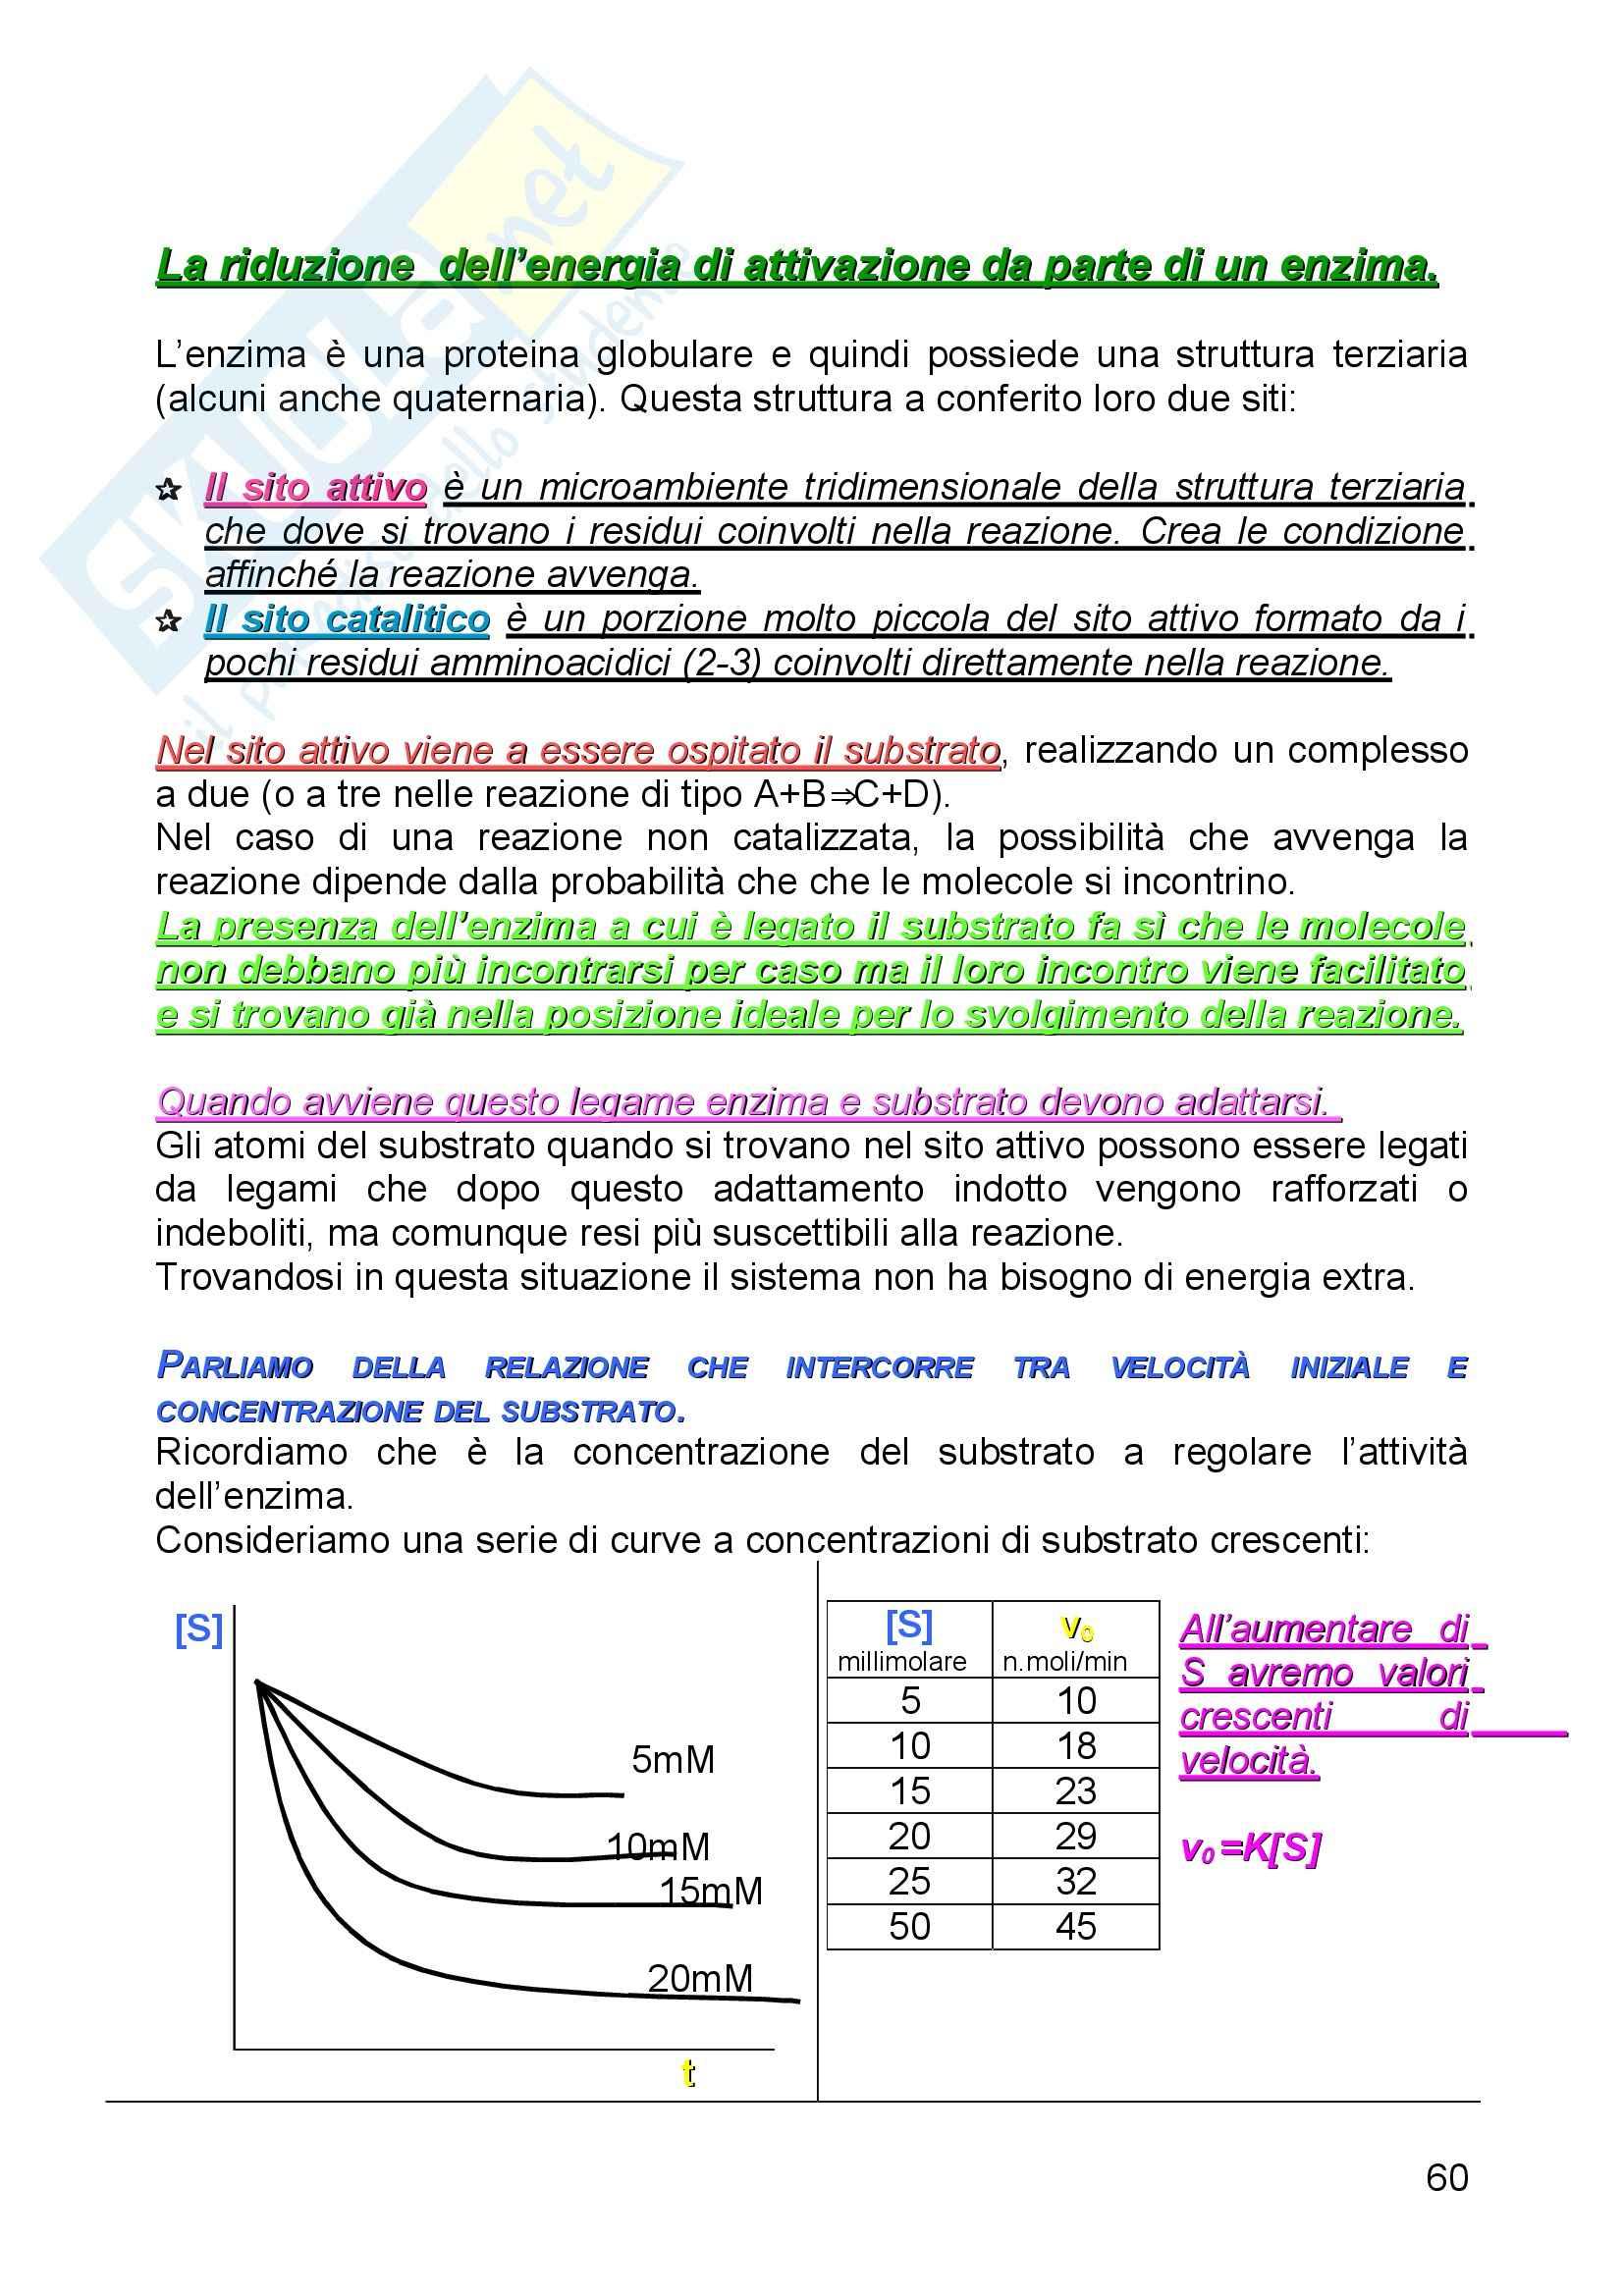 Biochimica I - Enzimi - Riassunto esame, prof. Camici Pag. 6